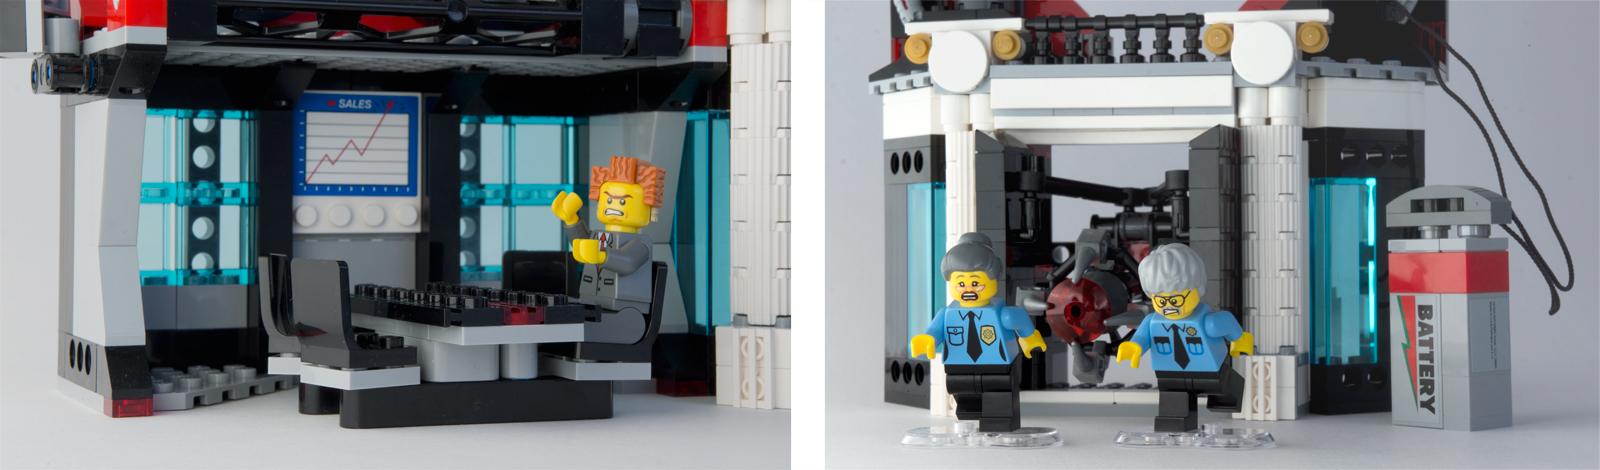 LEGO Set of 6 New Plates 6 X 6 Dark Bluish Gray  The Lego Movie  2014  8-14